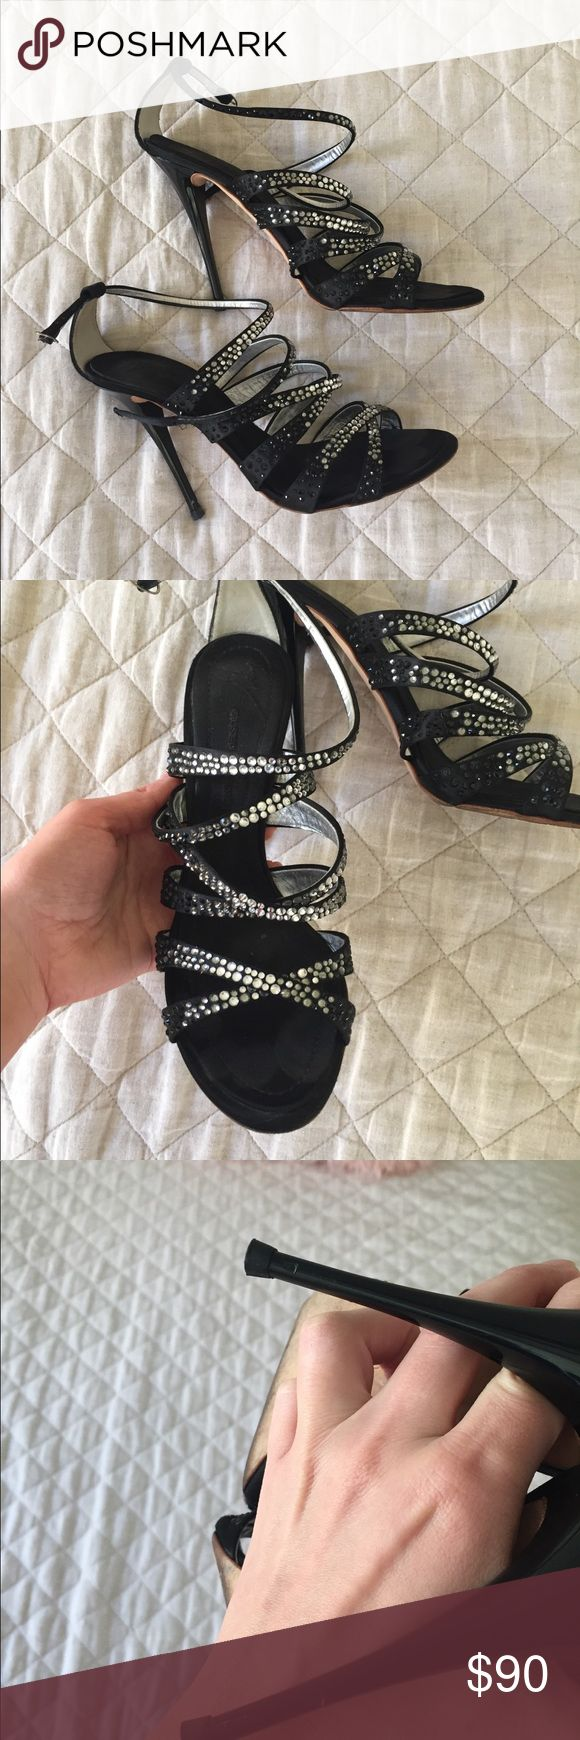 Giuseppe Zanotti Gorgeous GZ shoes with Swarovski crystals. 4 inch heel and no platform. Giuseppe Zanotti Shoes Sandals